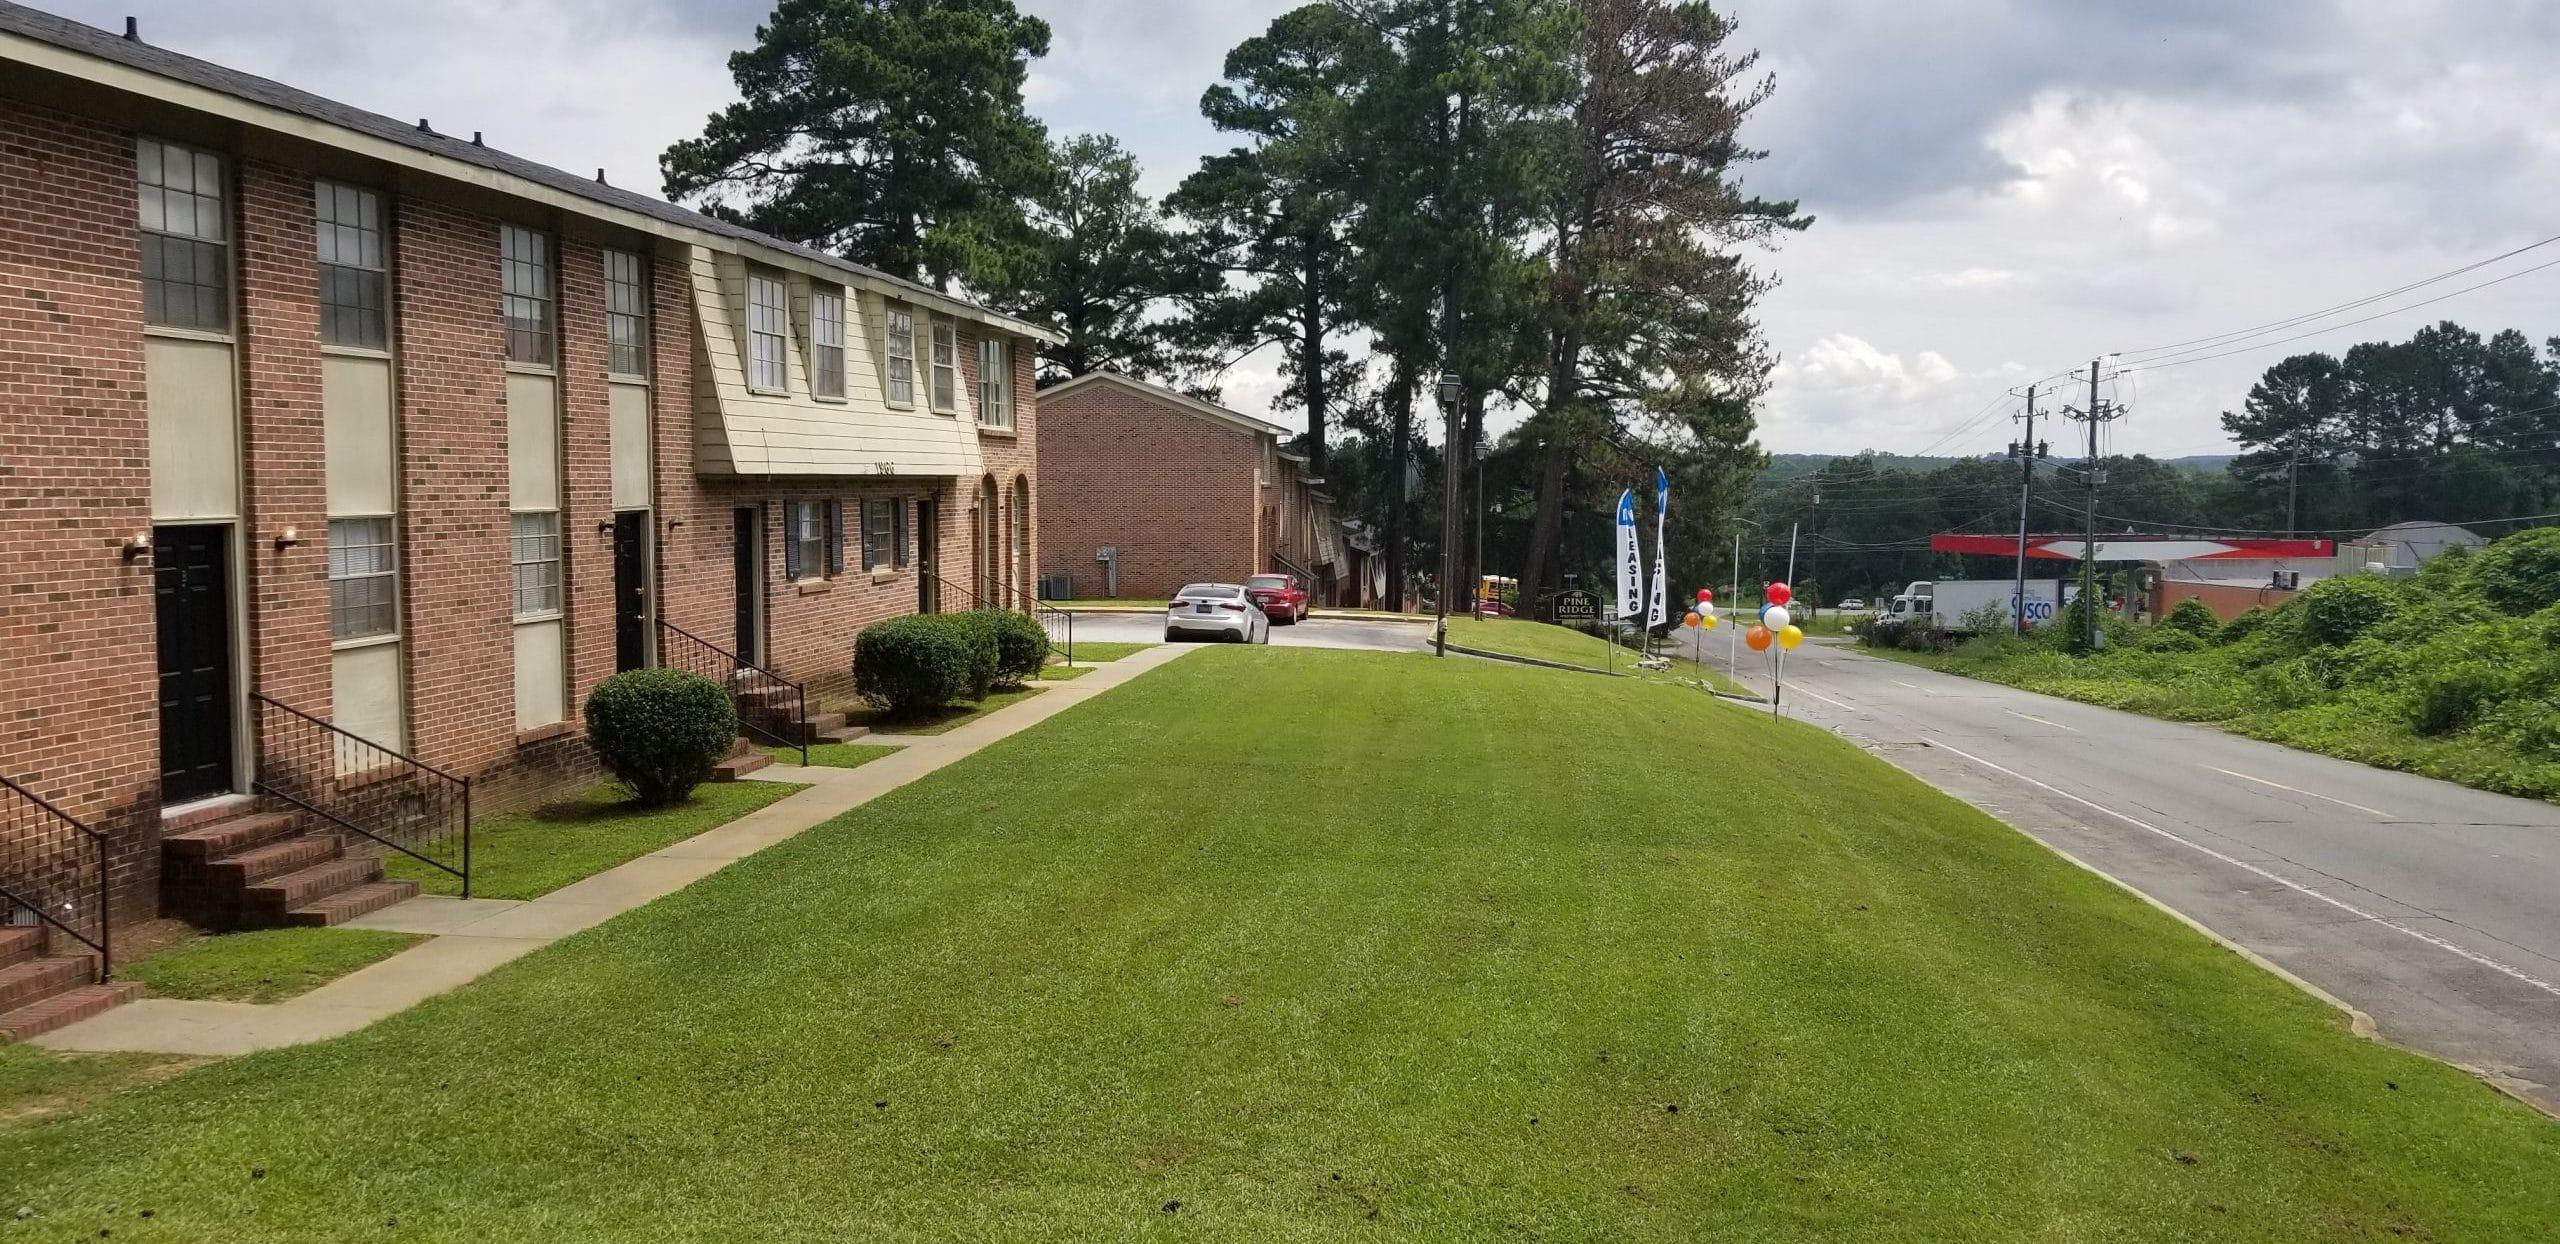 Exterior Property Photo of Pine Ridge Apartments